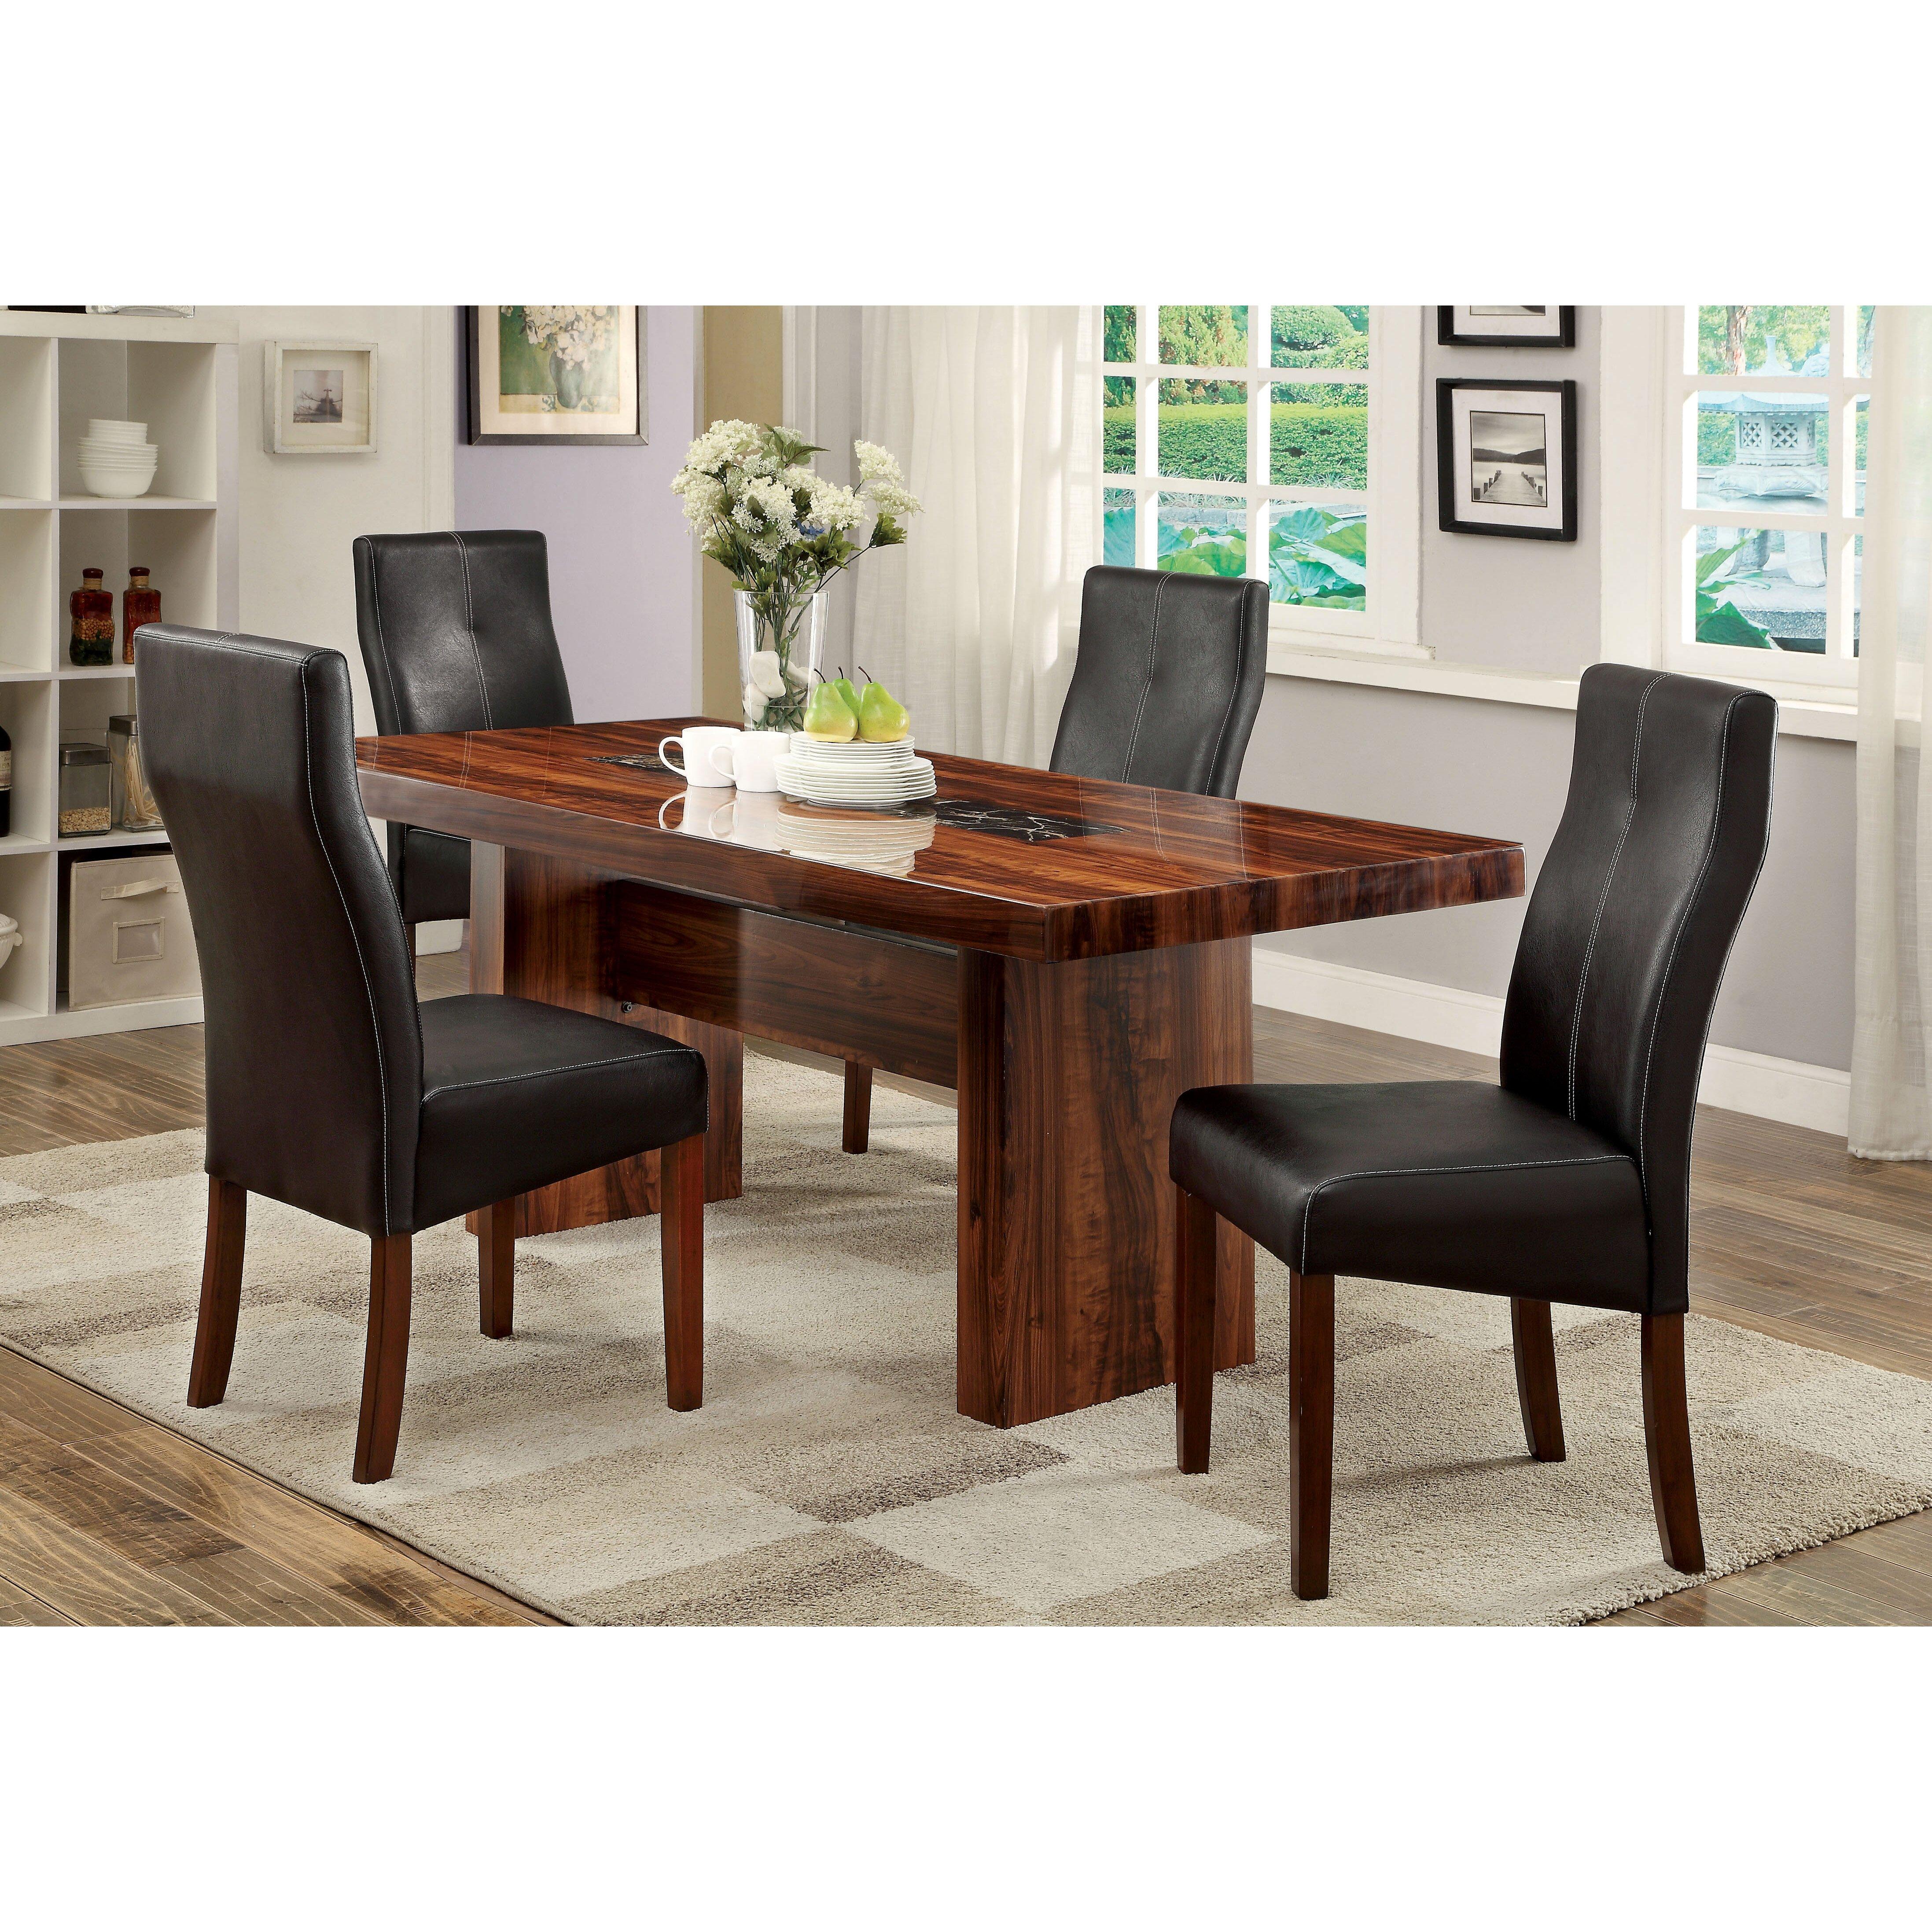 Hokku designs carroll dining table wayfair for Hokku designs dining room furniture